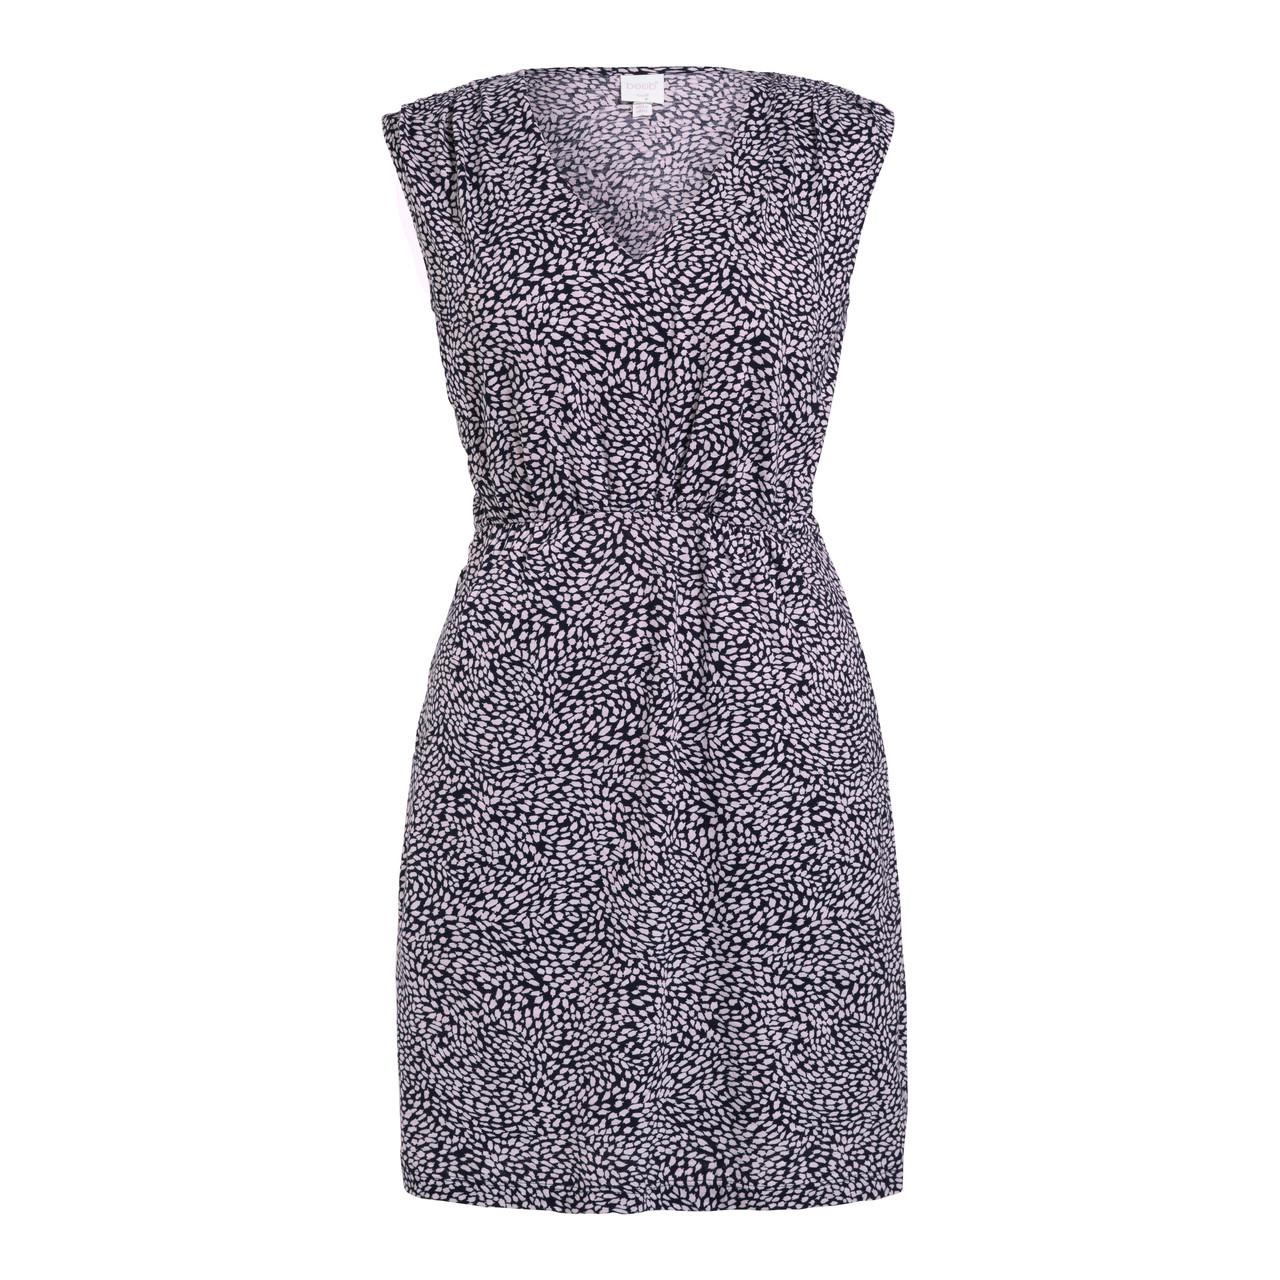 ced540ef1553f Boob Design Misty Dress - Midnight Blue Print - Stockholm Objects